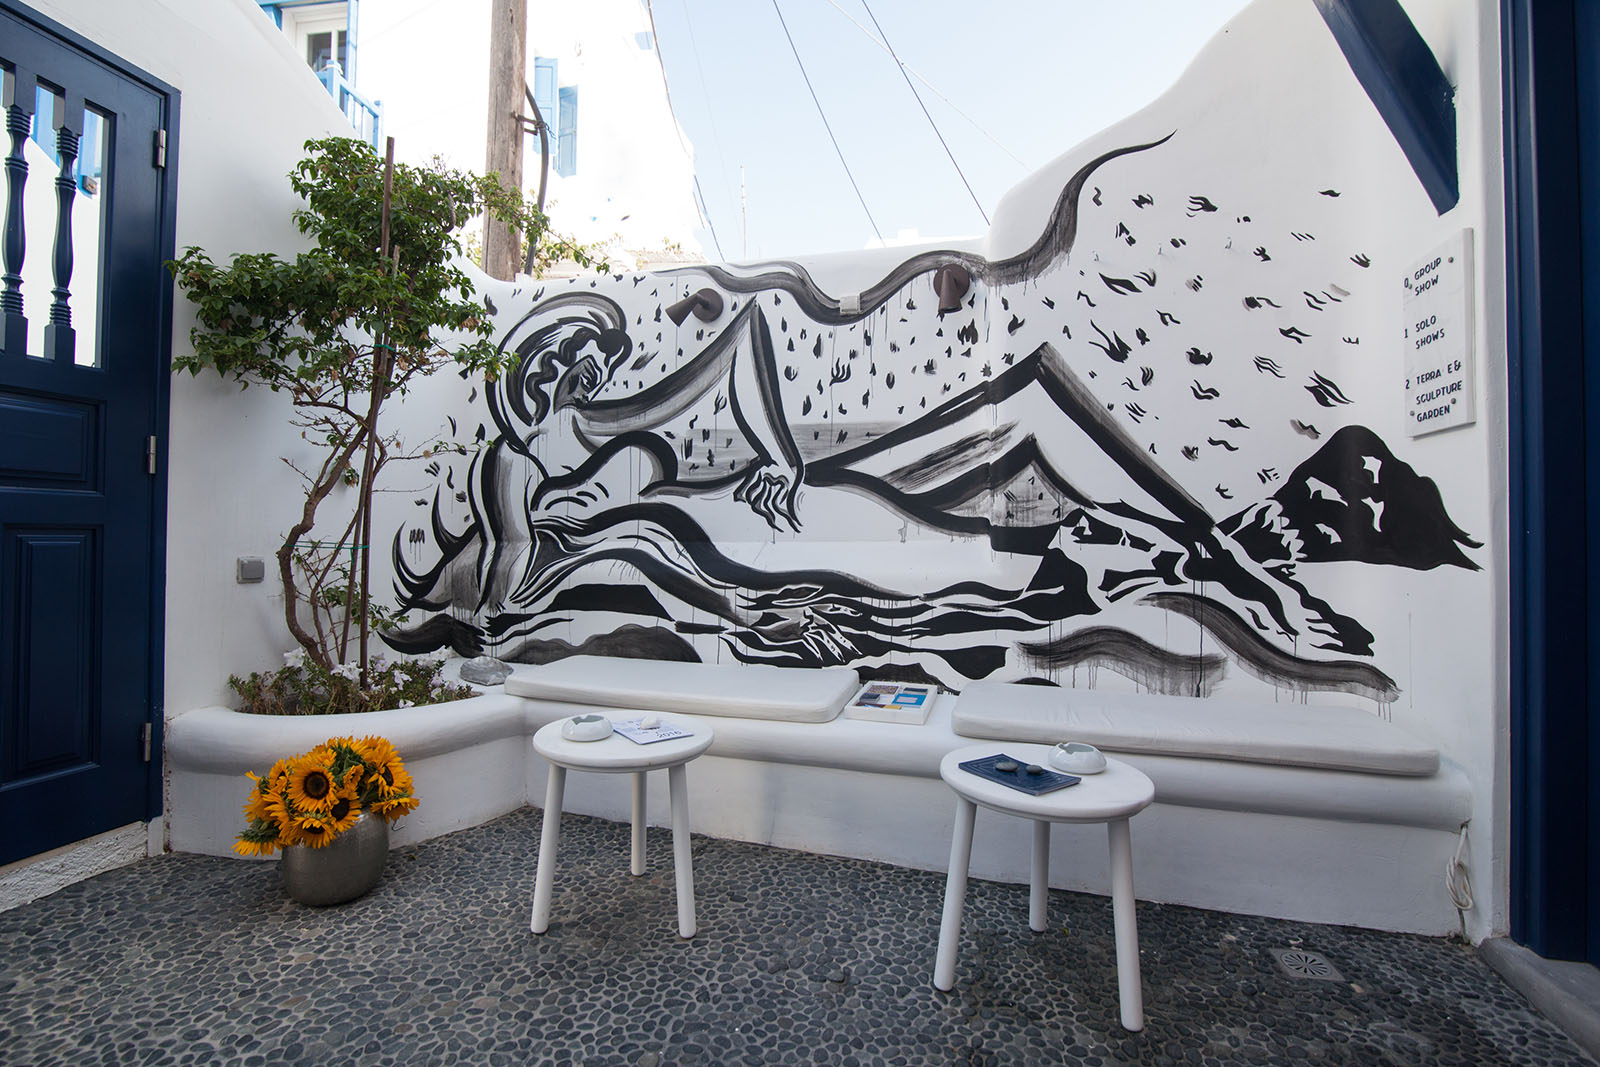 Mira Dancy Mural_Yard_2016_1.jpg